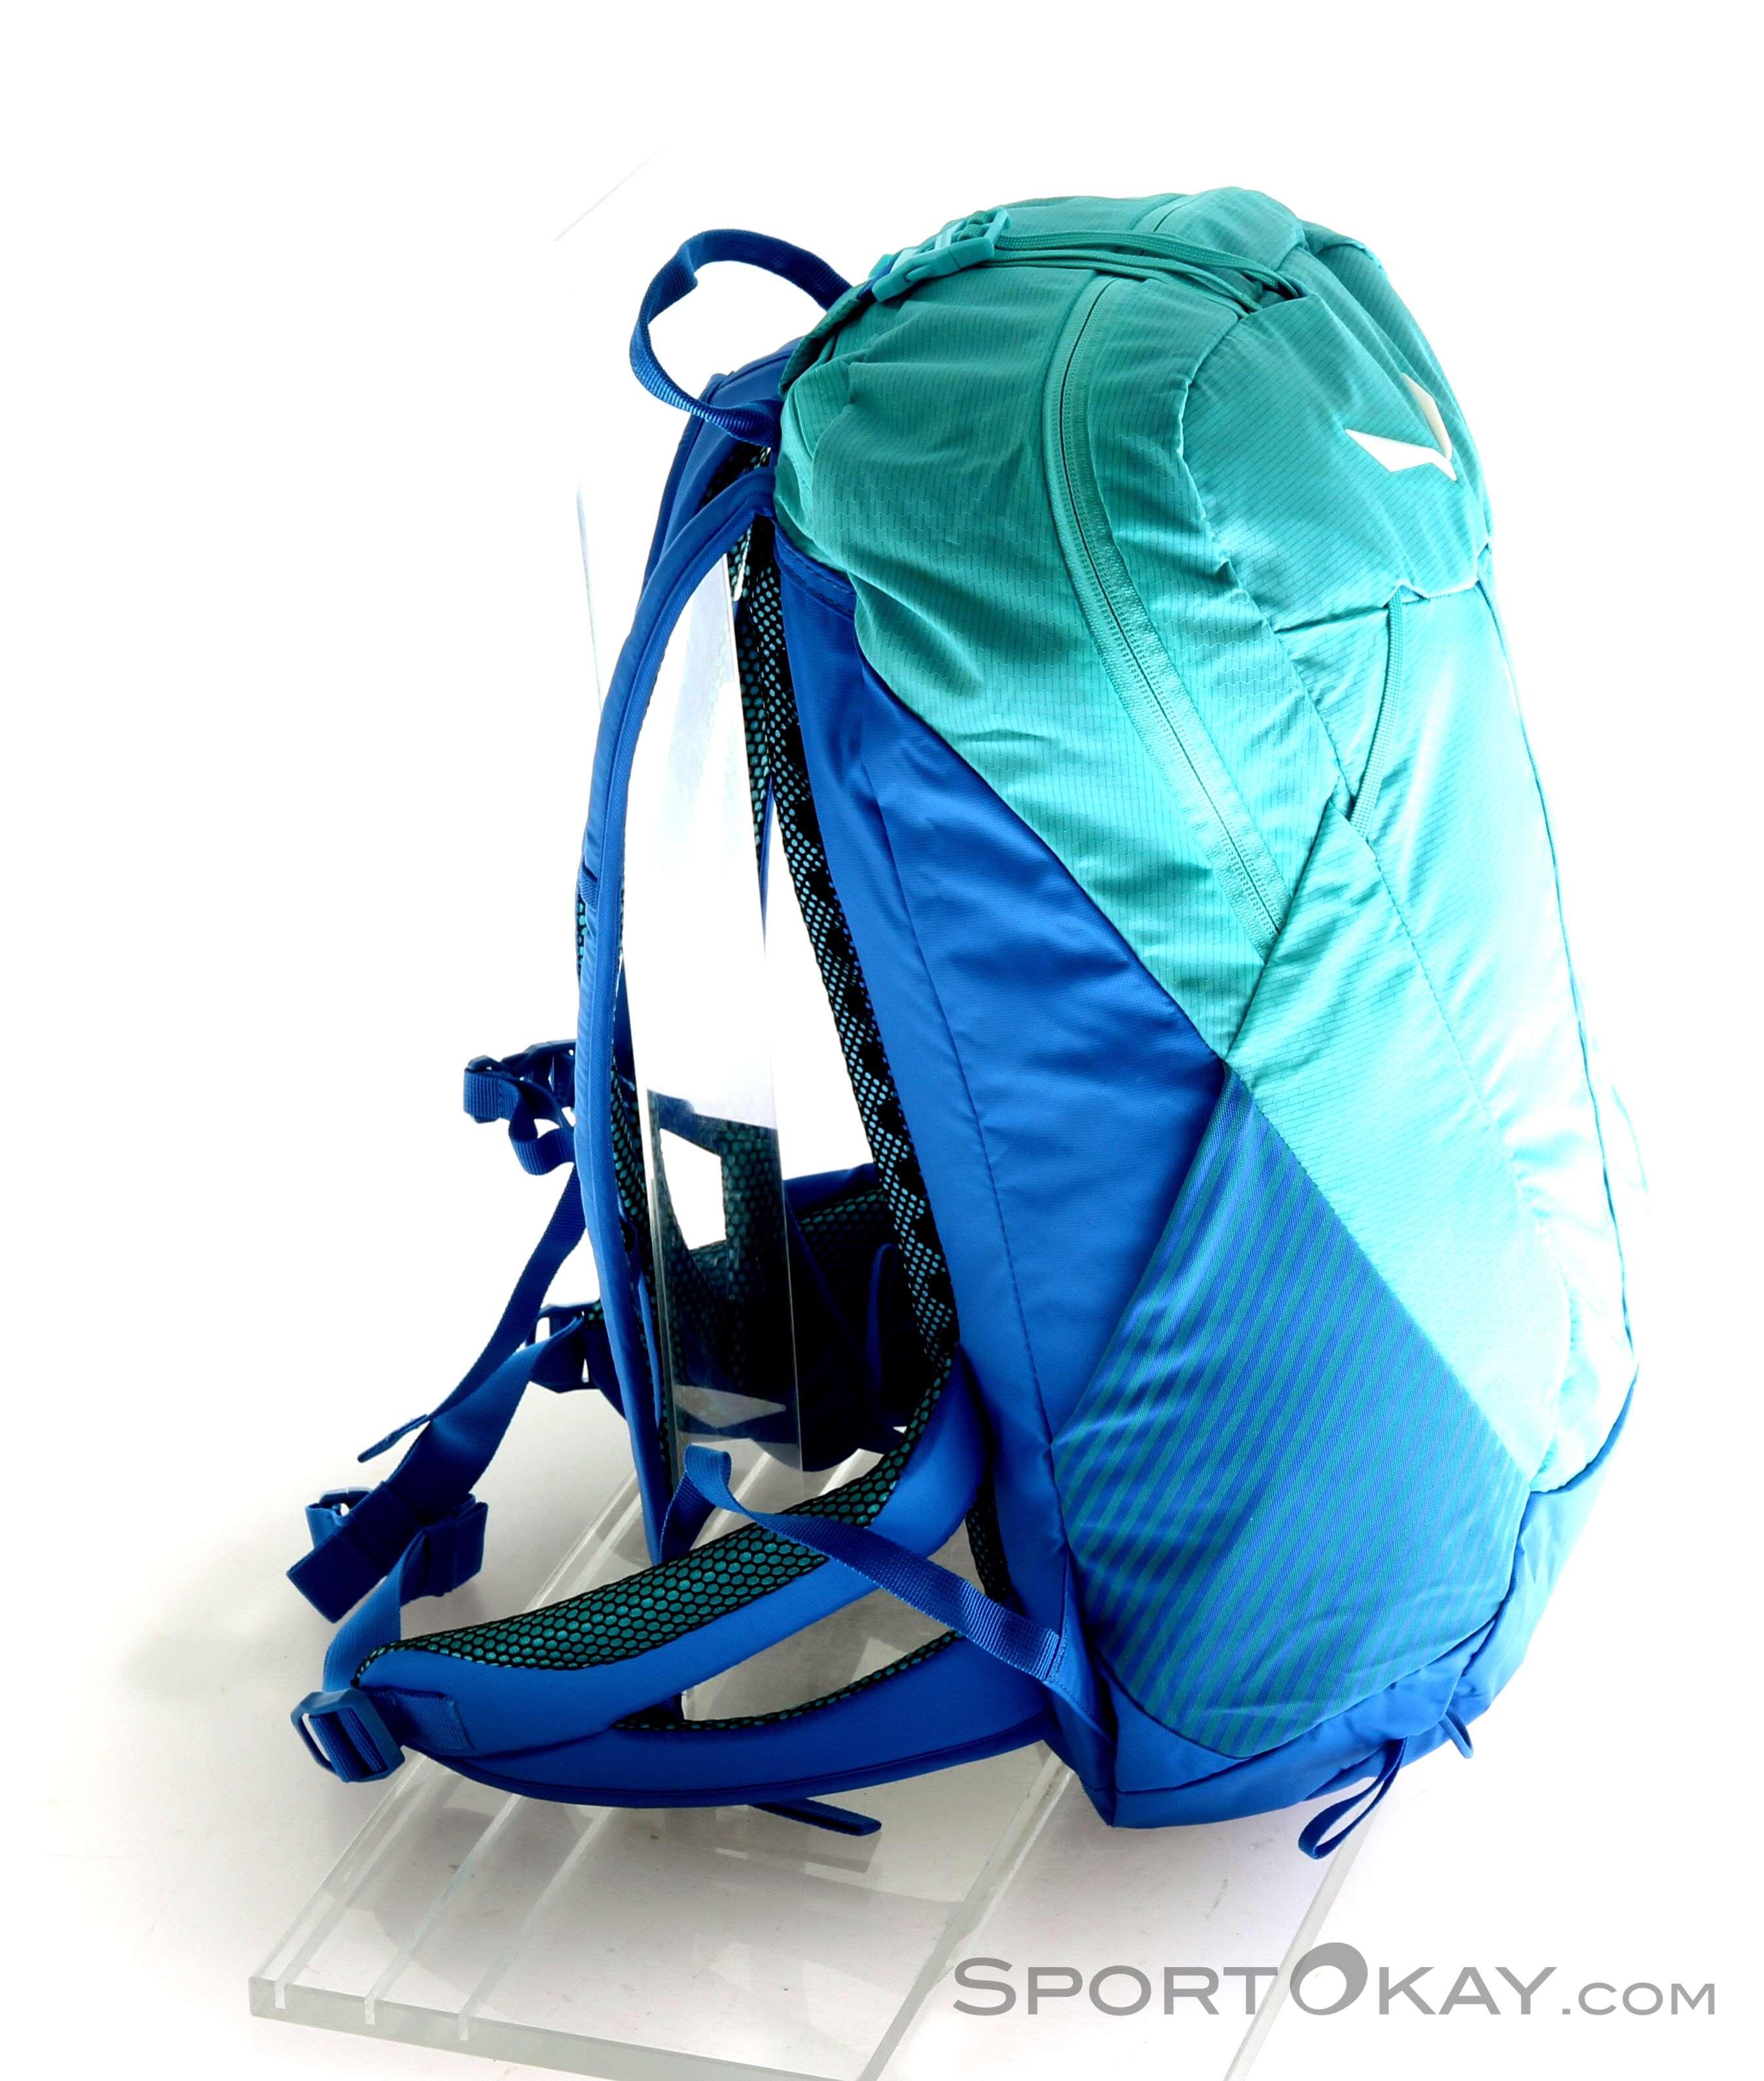 Salewa Mountain Trainer 22L Backpack Daypacks & Casual Bags Womens